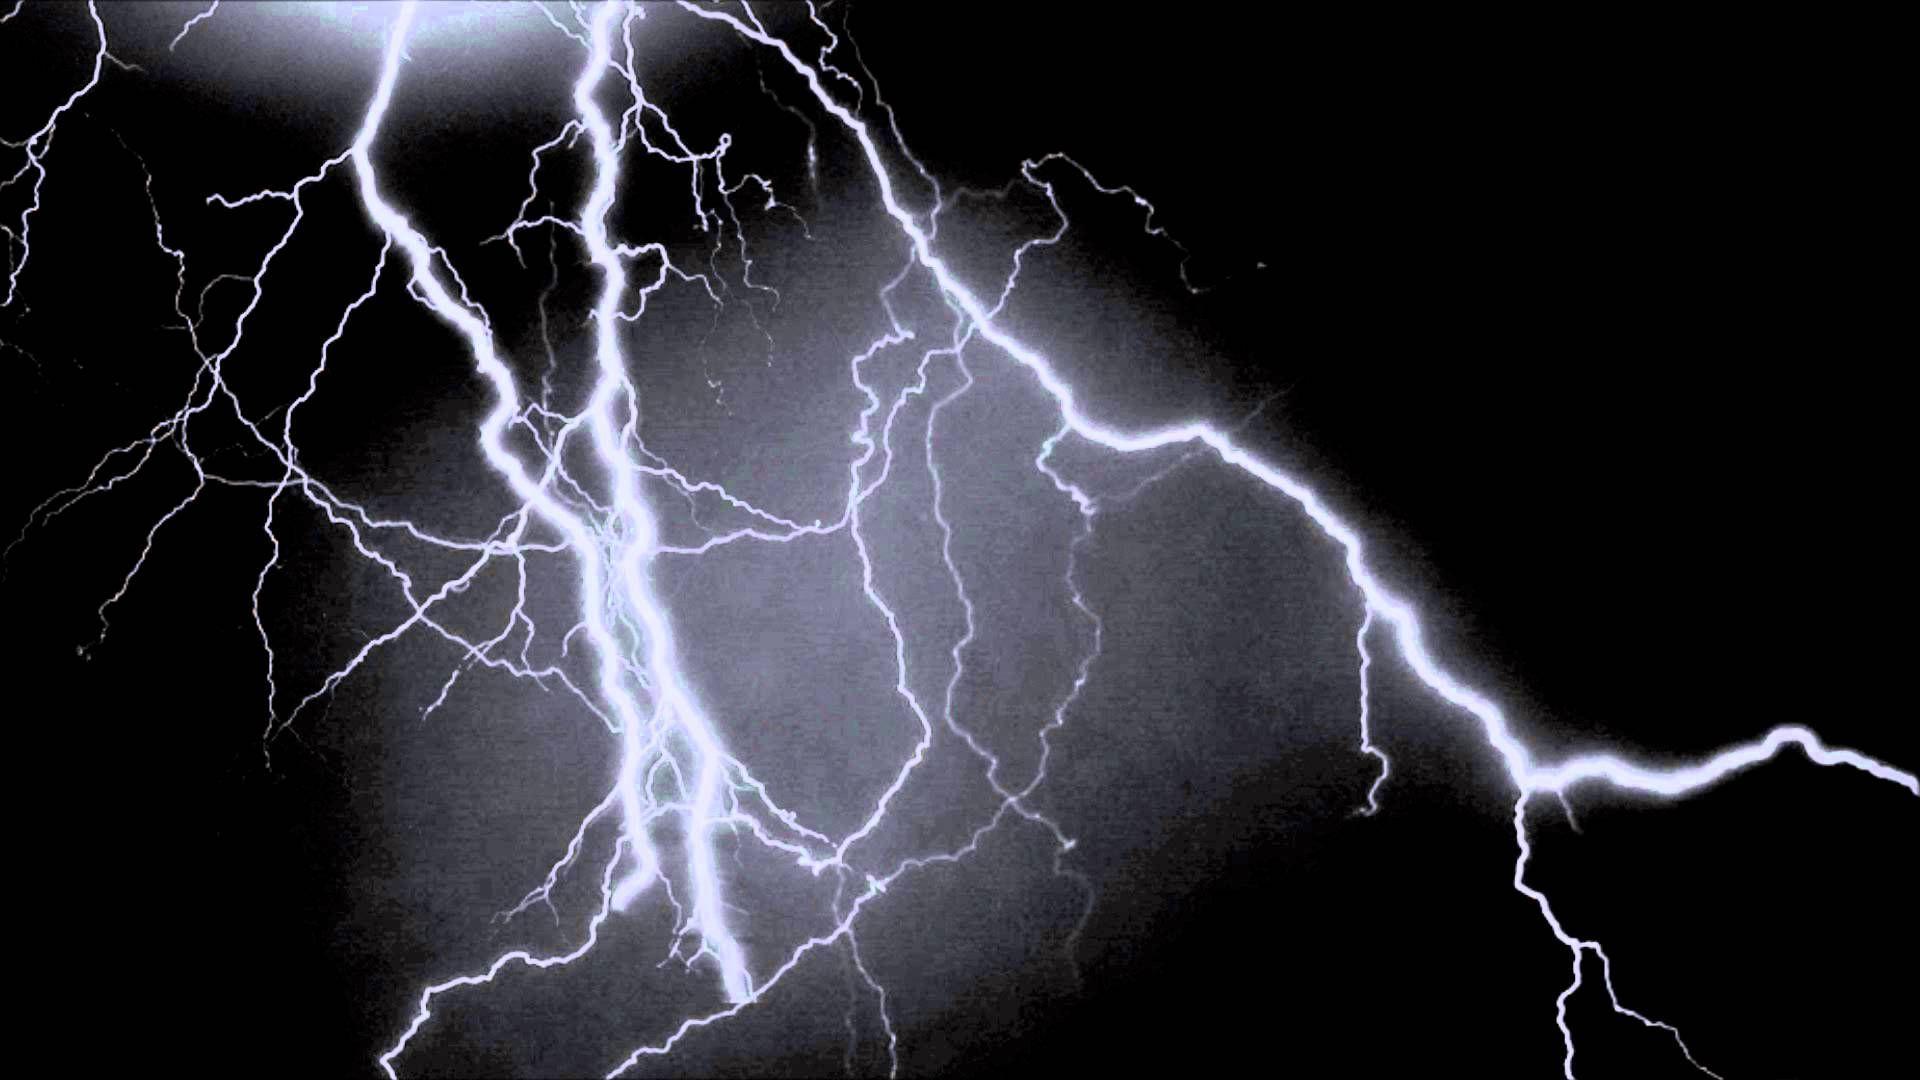 Lightning Bolt Wallpaper and Background